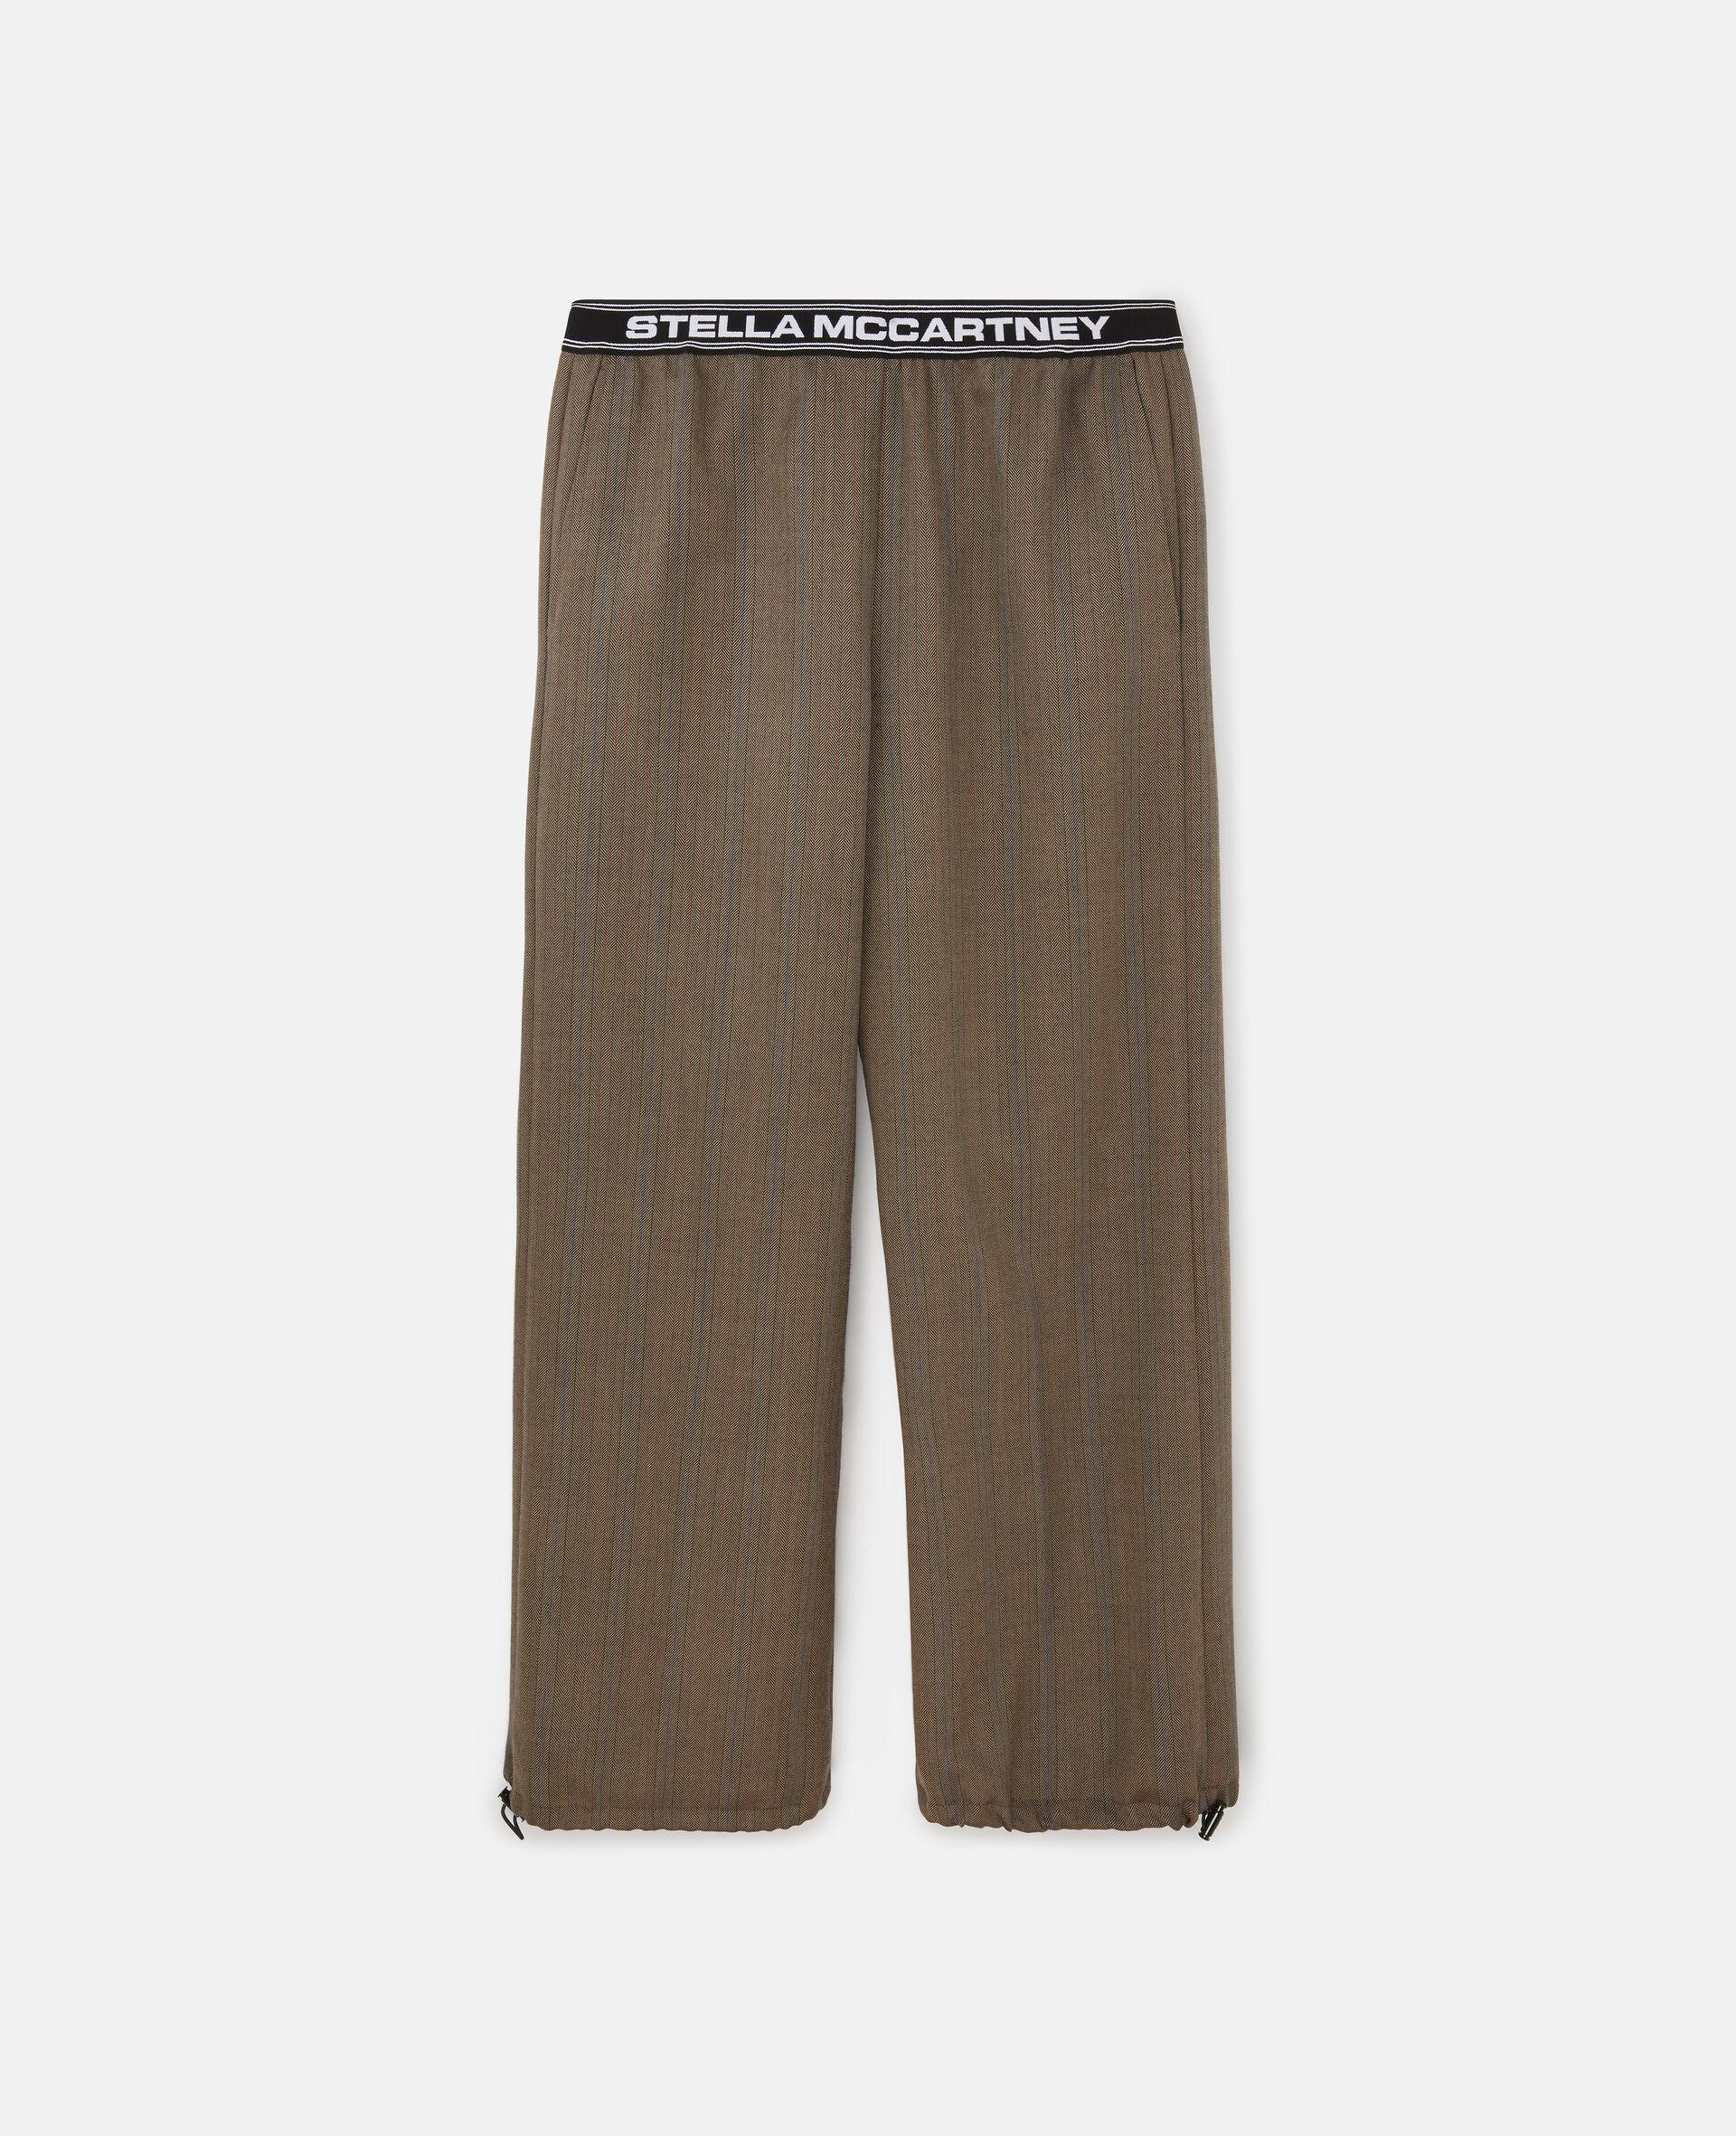 Taillierte Hosen mit Stella Logo -Bunt-large image number 0